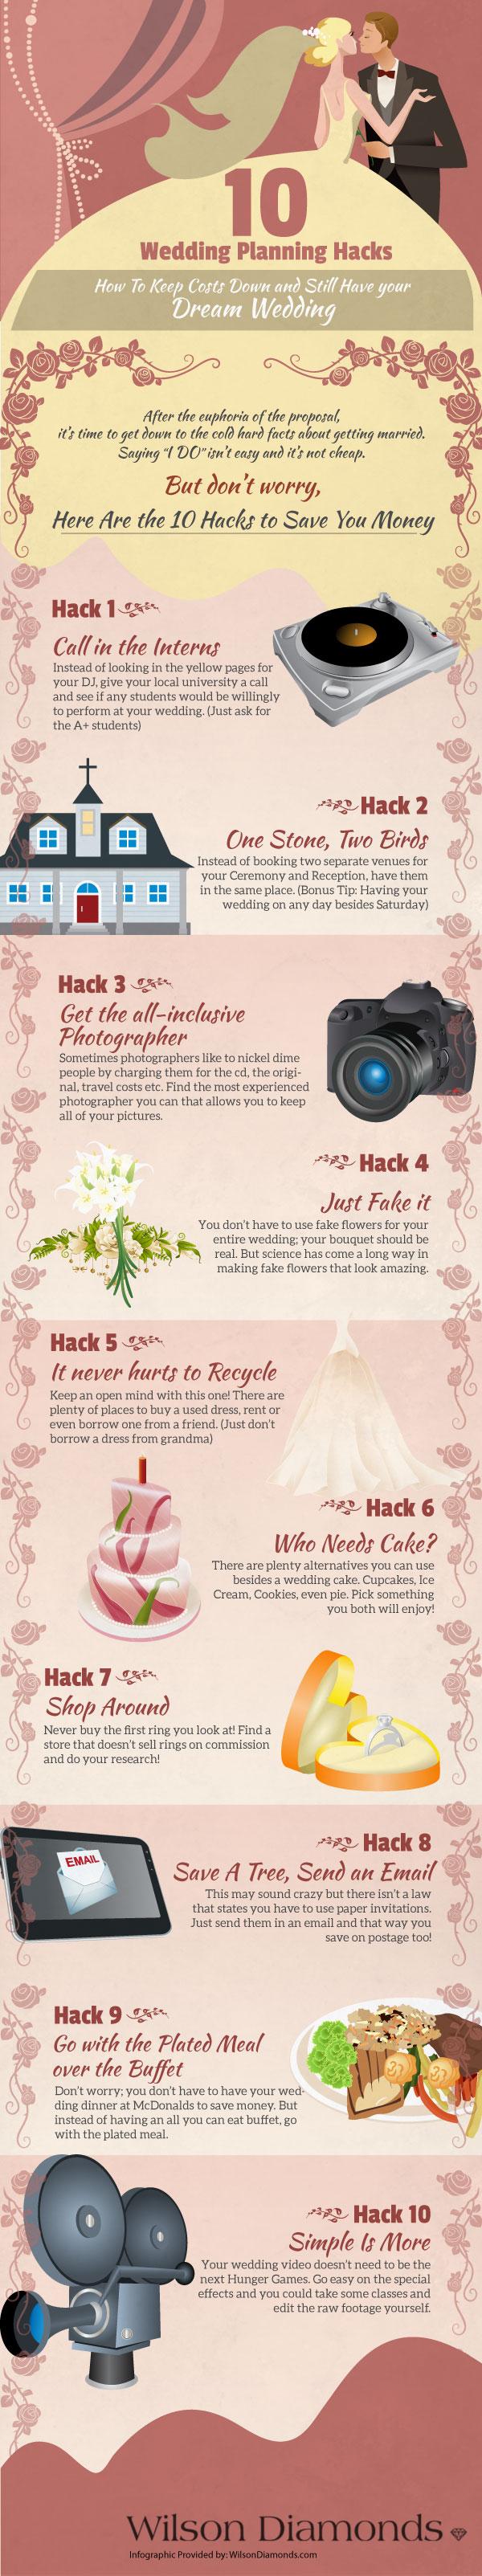 10 Wedding Planning Hacks